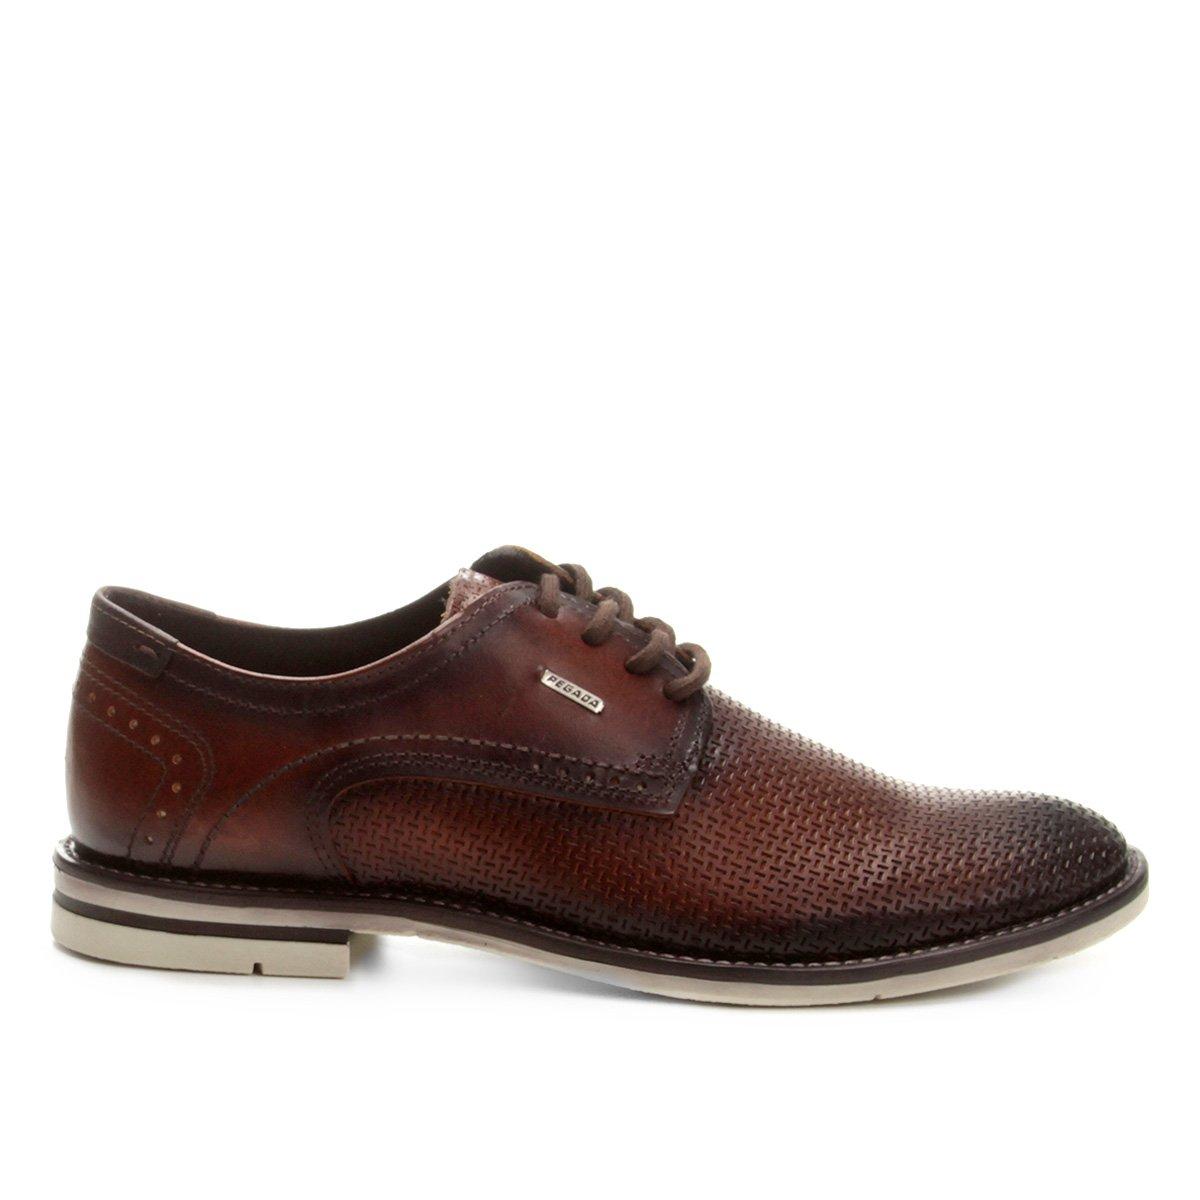 Marrom Couro Pegada Pegada Sapato Masculino Casual Sapato Couro q0dpSxtt